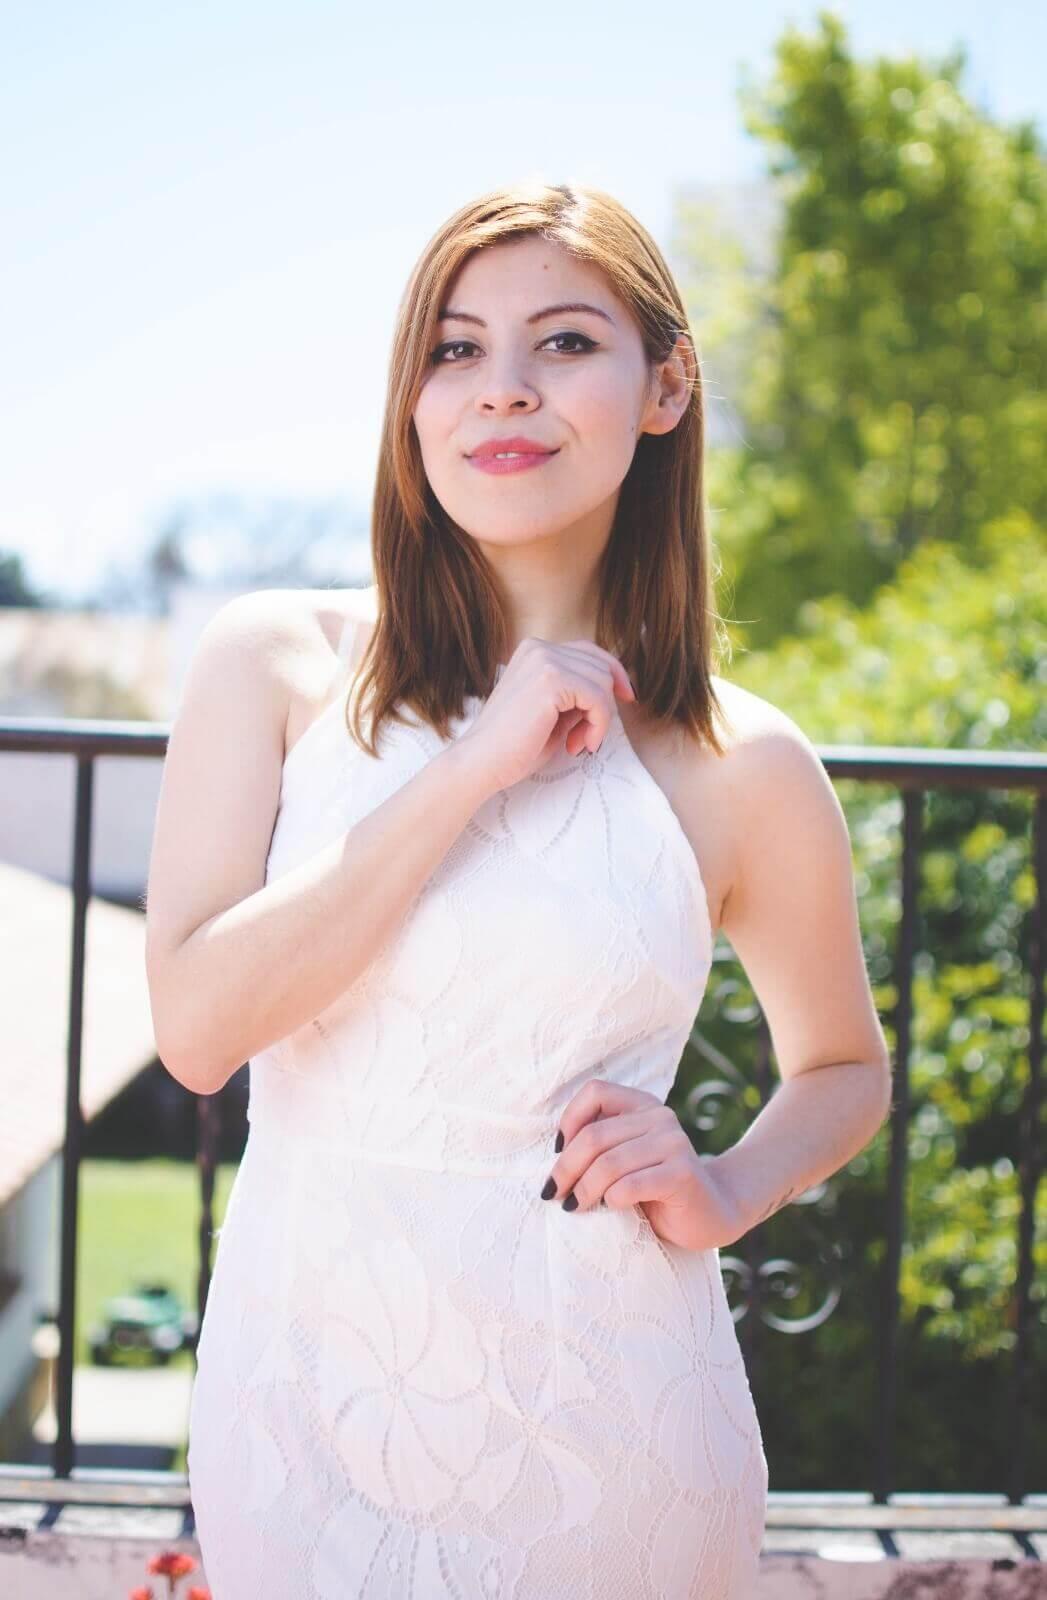 gamiss-white-lace-dress-halter-neck-dresses-cocktail-dresses-2016-zaful-black-suede-stilettos-deborah-ferrero-style-by-deb10